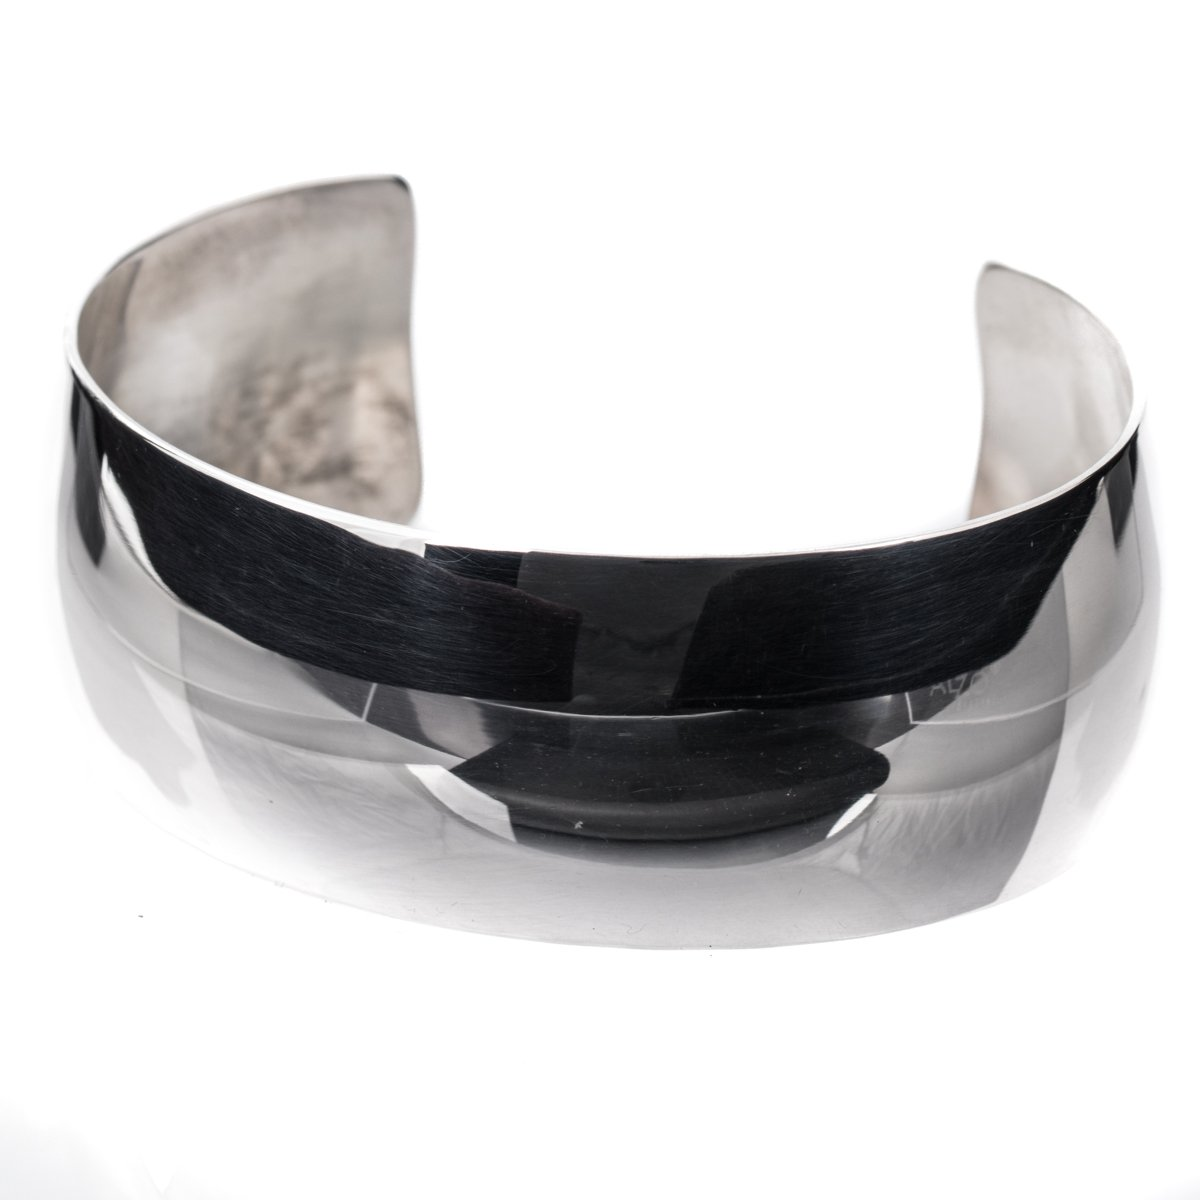 TSKIES Genuine Navajo Handmade Mirror Sterling Silver .925 High Polish Cuff Bracelet Native American Jewelry (Large)